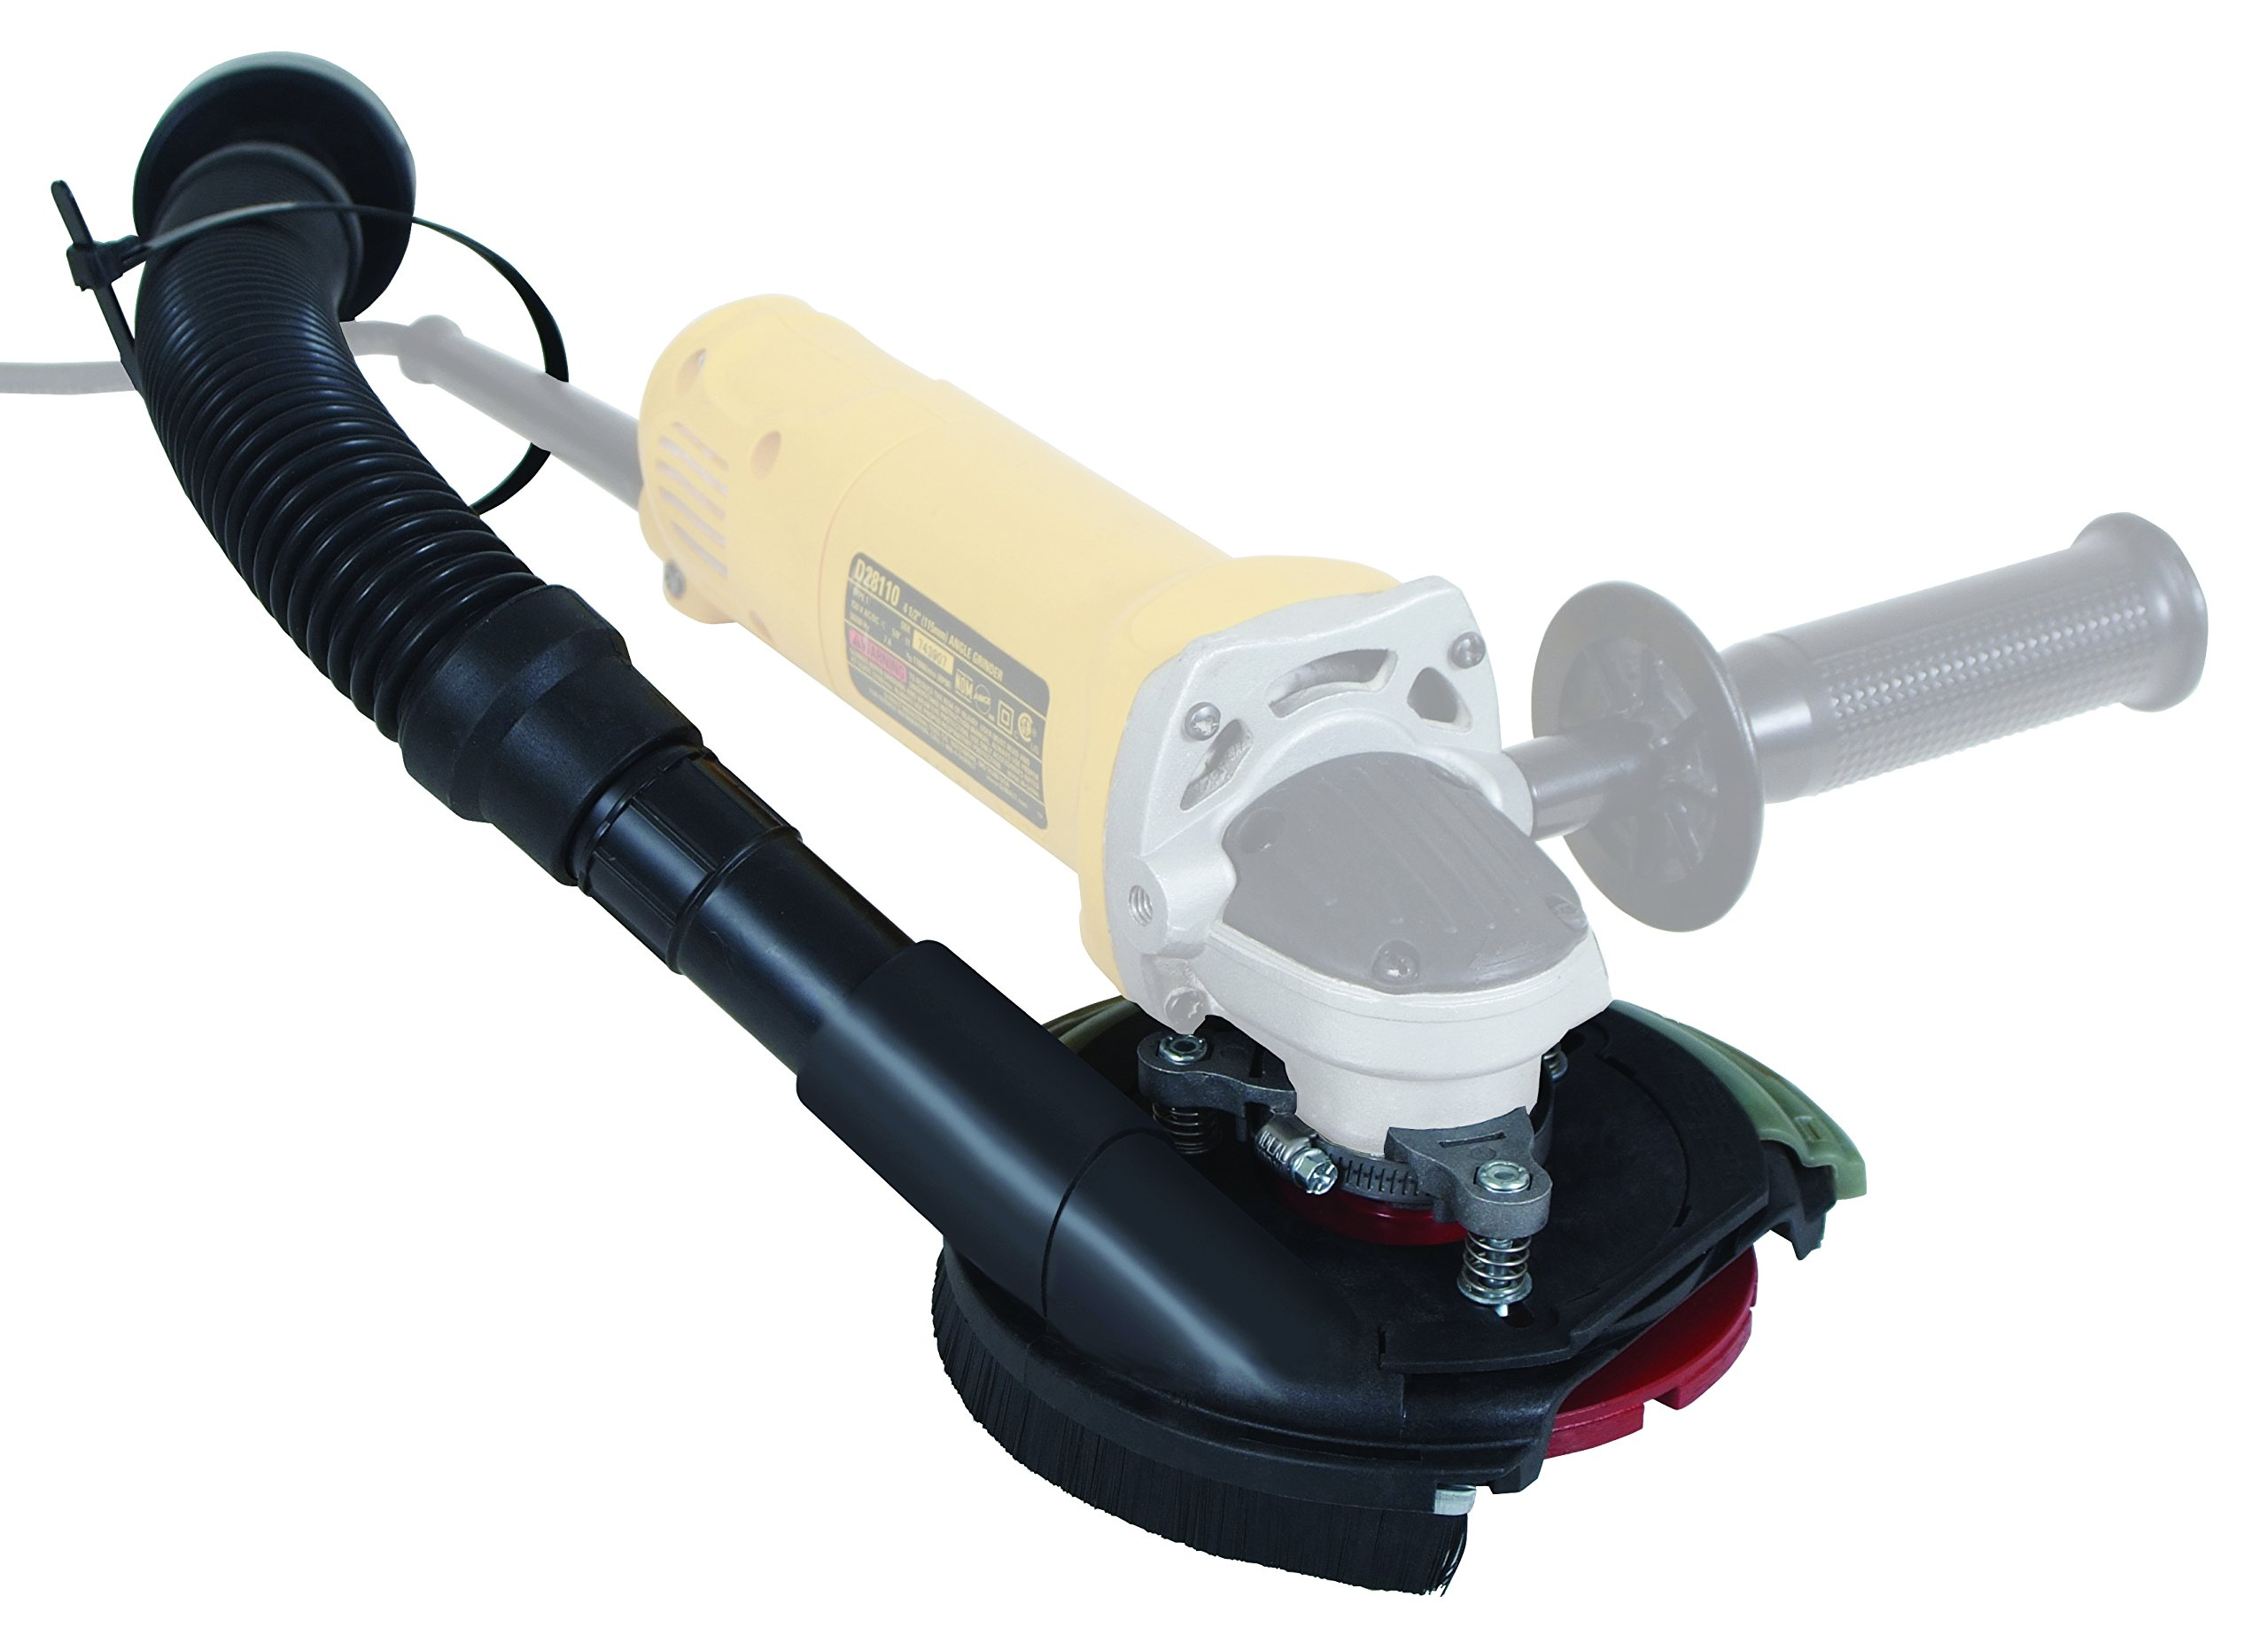 Dustless Technologies D5850 Dust Buddie XP Universal Dust Control Attachment for Grinders, 7'', Black/Gray by Dustless Technologies (Image #3)